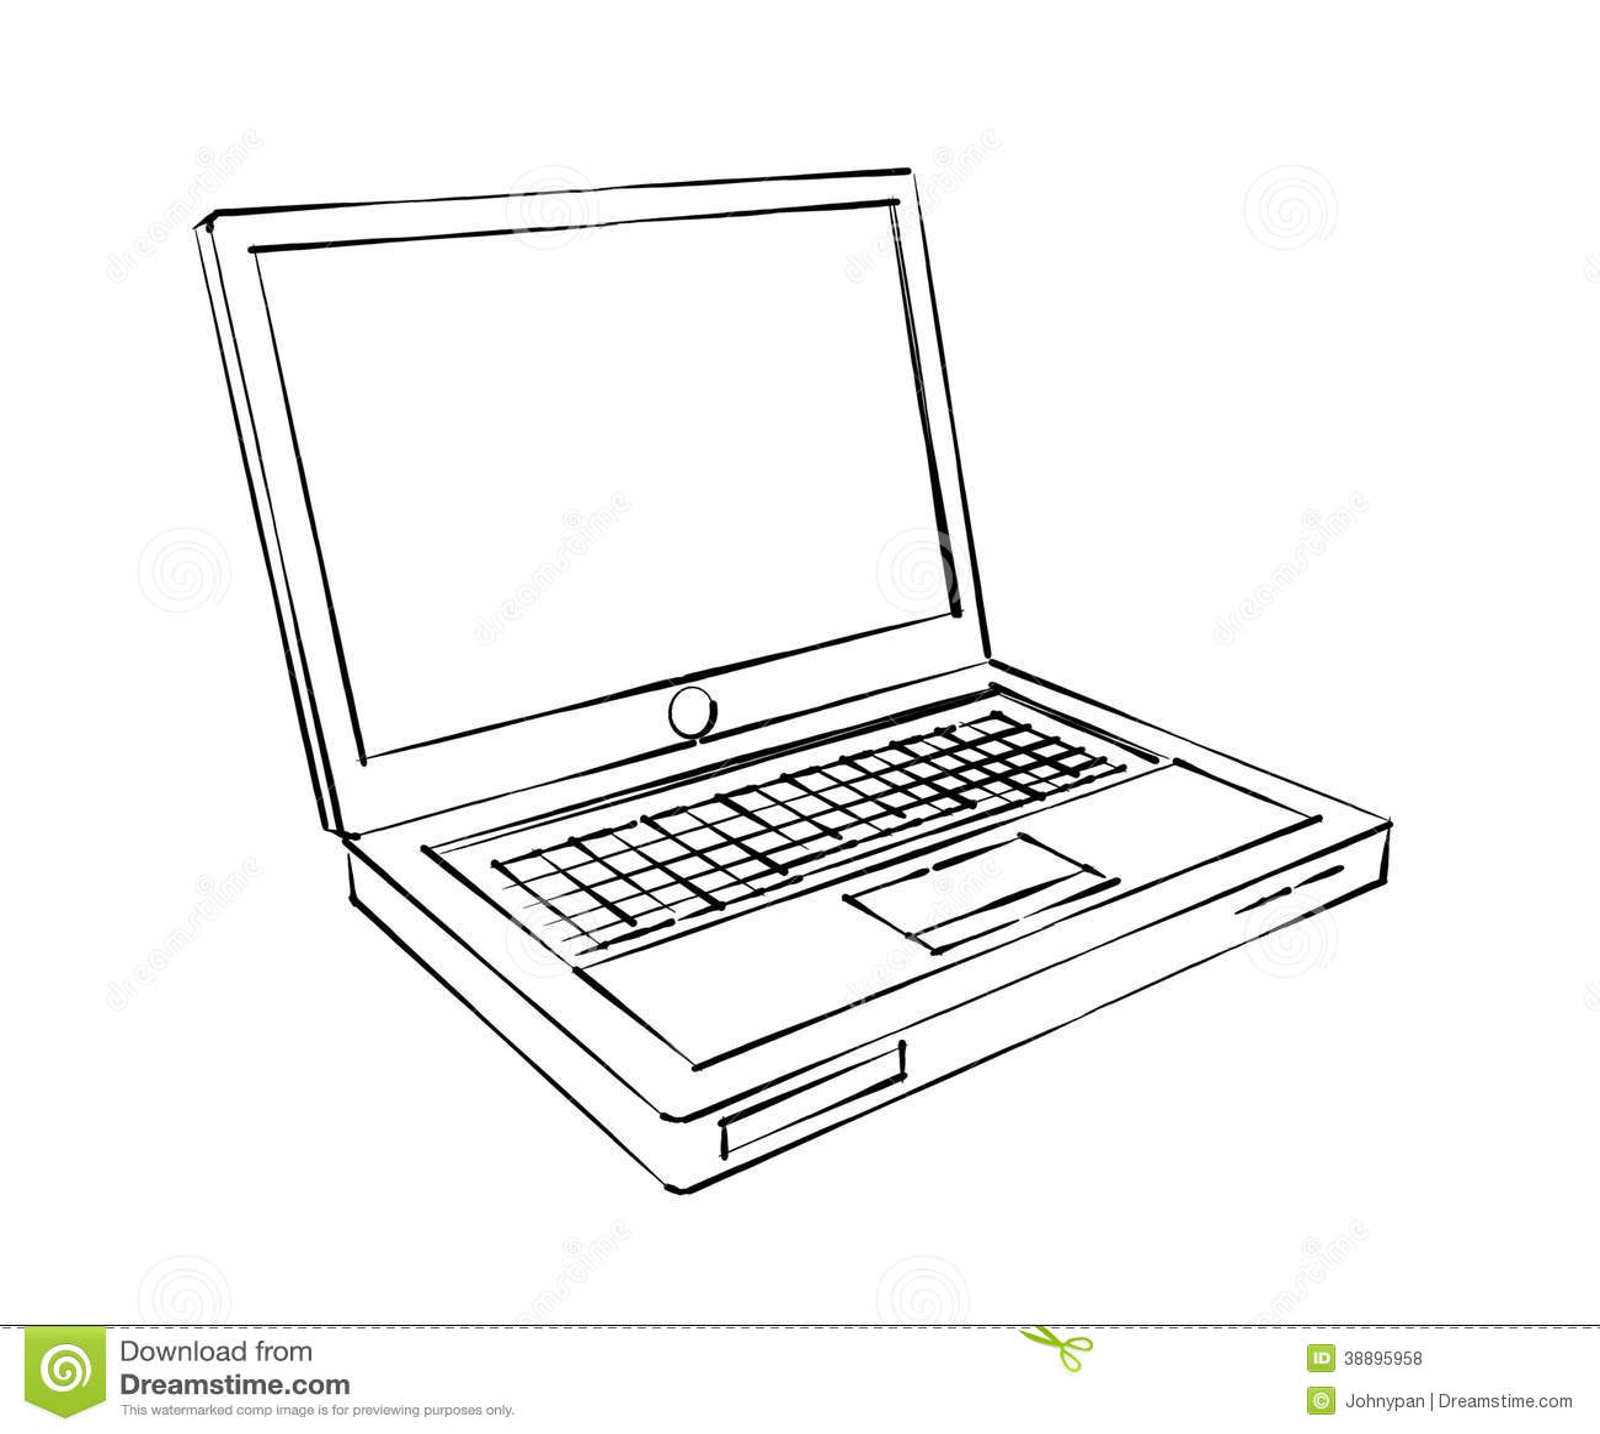 Laptop Computer Sketch Stock Illustration Illustration Of